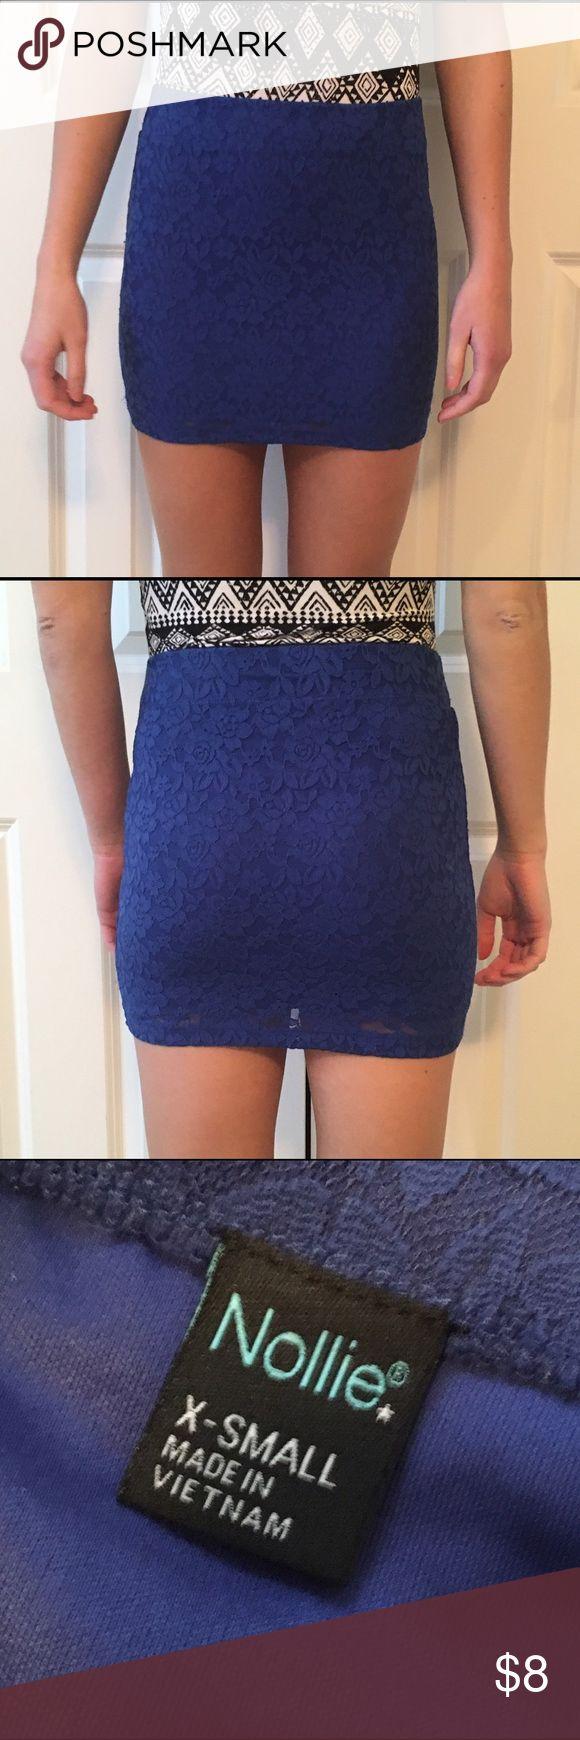 Blue Pencil Skirt Very comfy blue pencil skirt Nollie Skirts Pencil